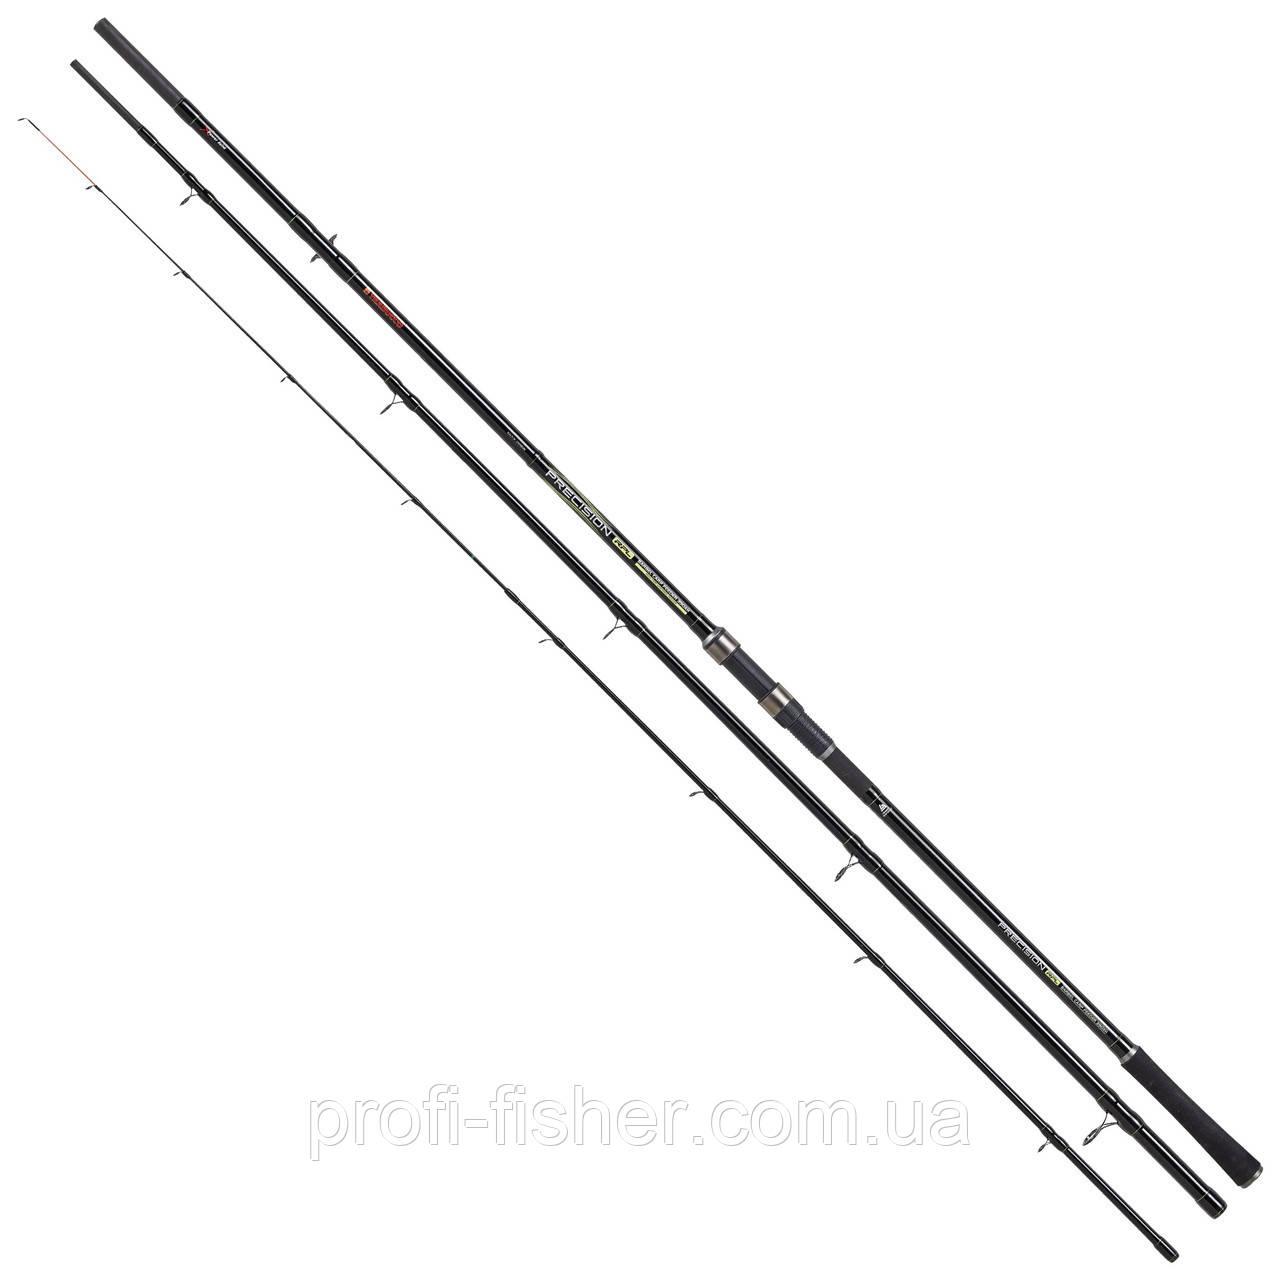 Удилище фидерное Trabucco PRECISION RPL BARBEL & CARP FEEDER*3903(2)/HH(150)